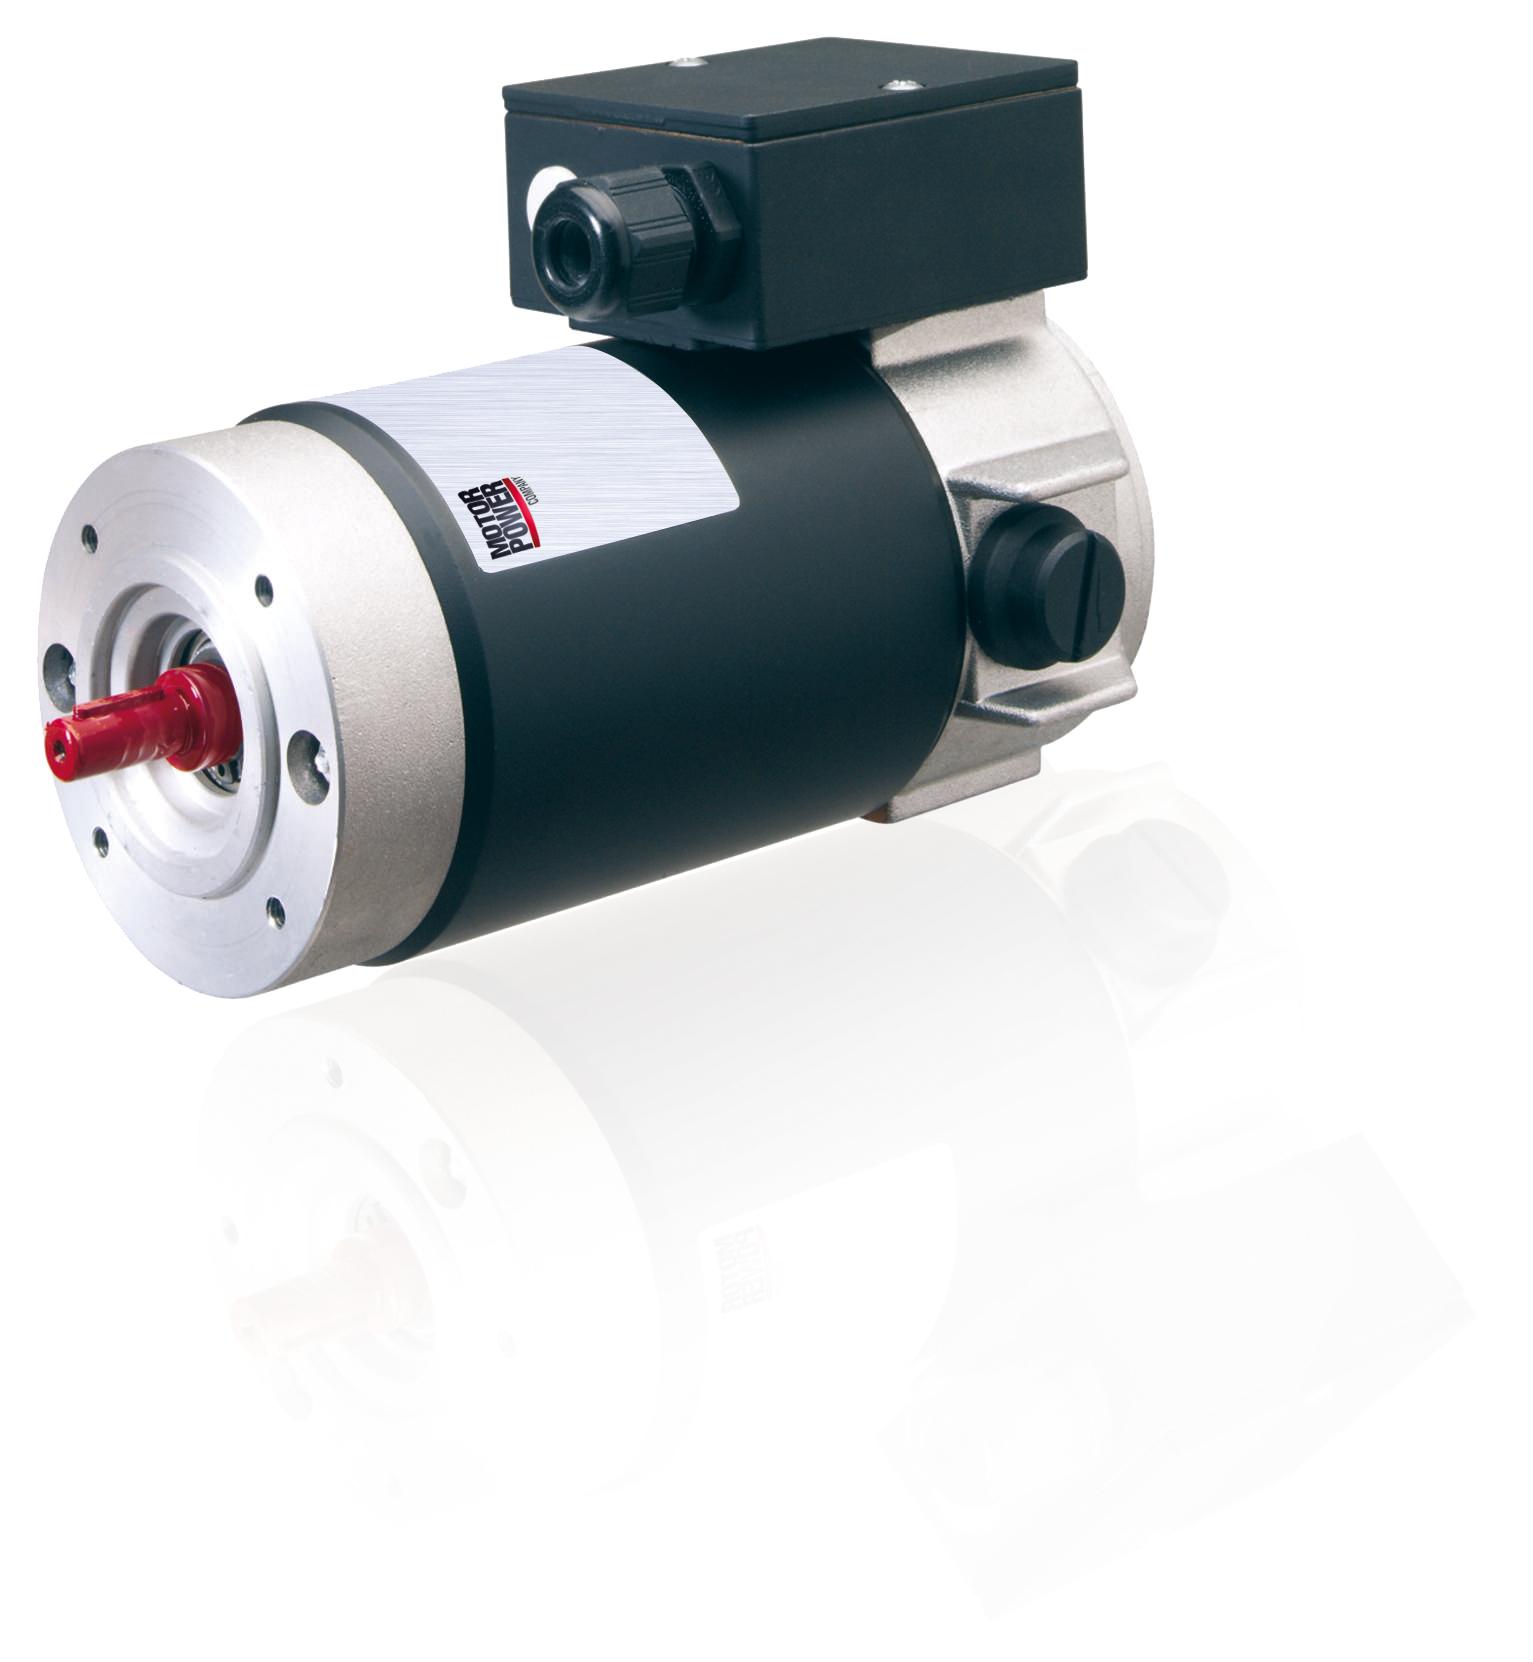 Motor Power PENTA 4L20直流电机有刷